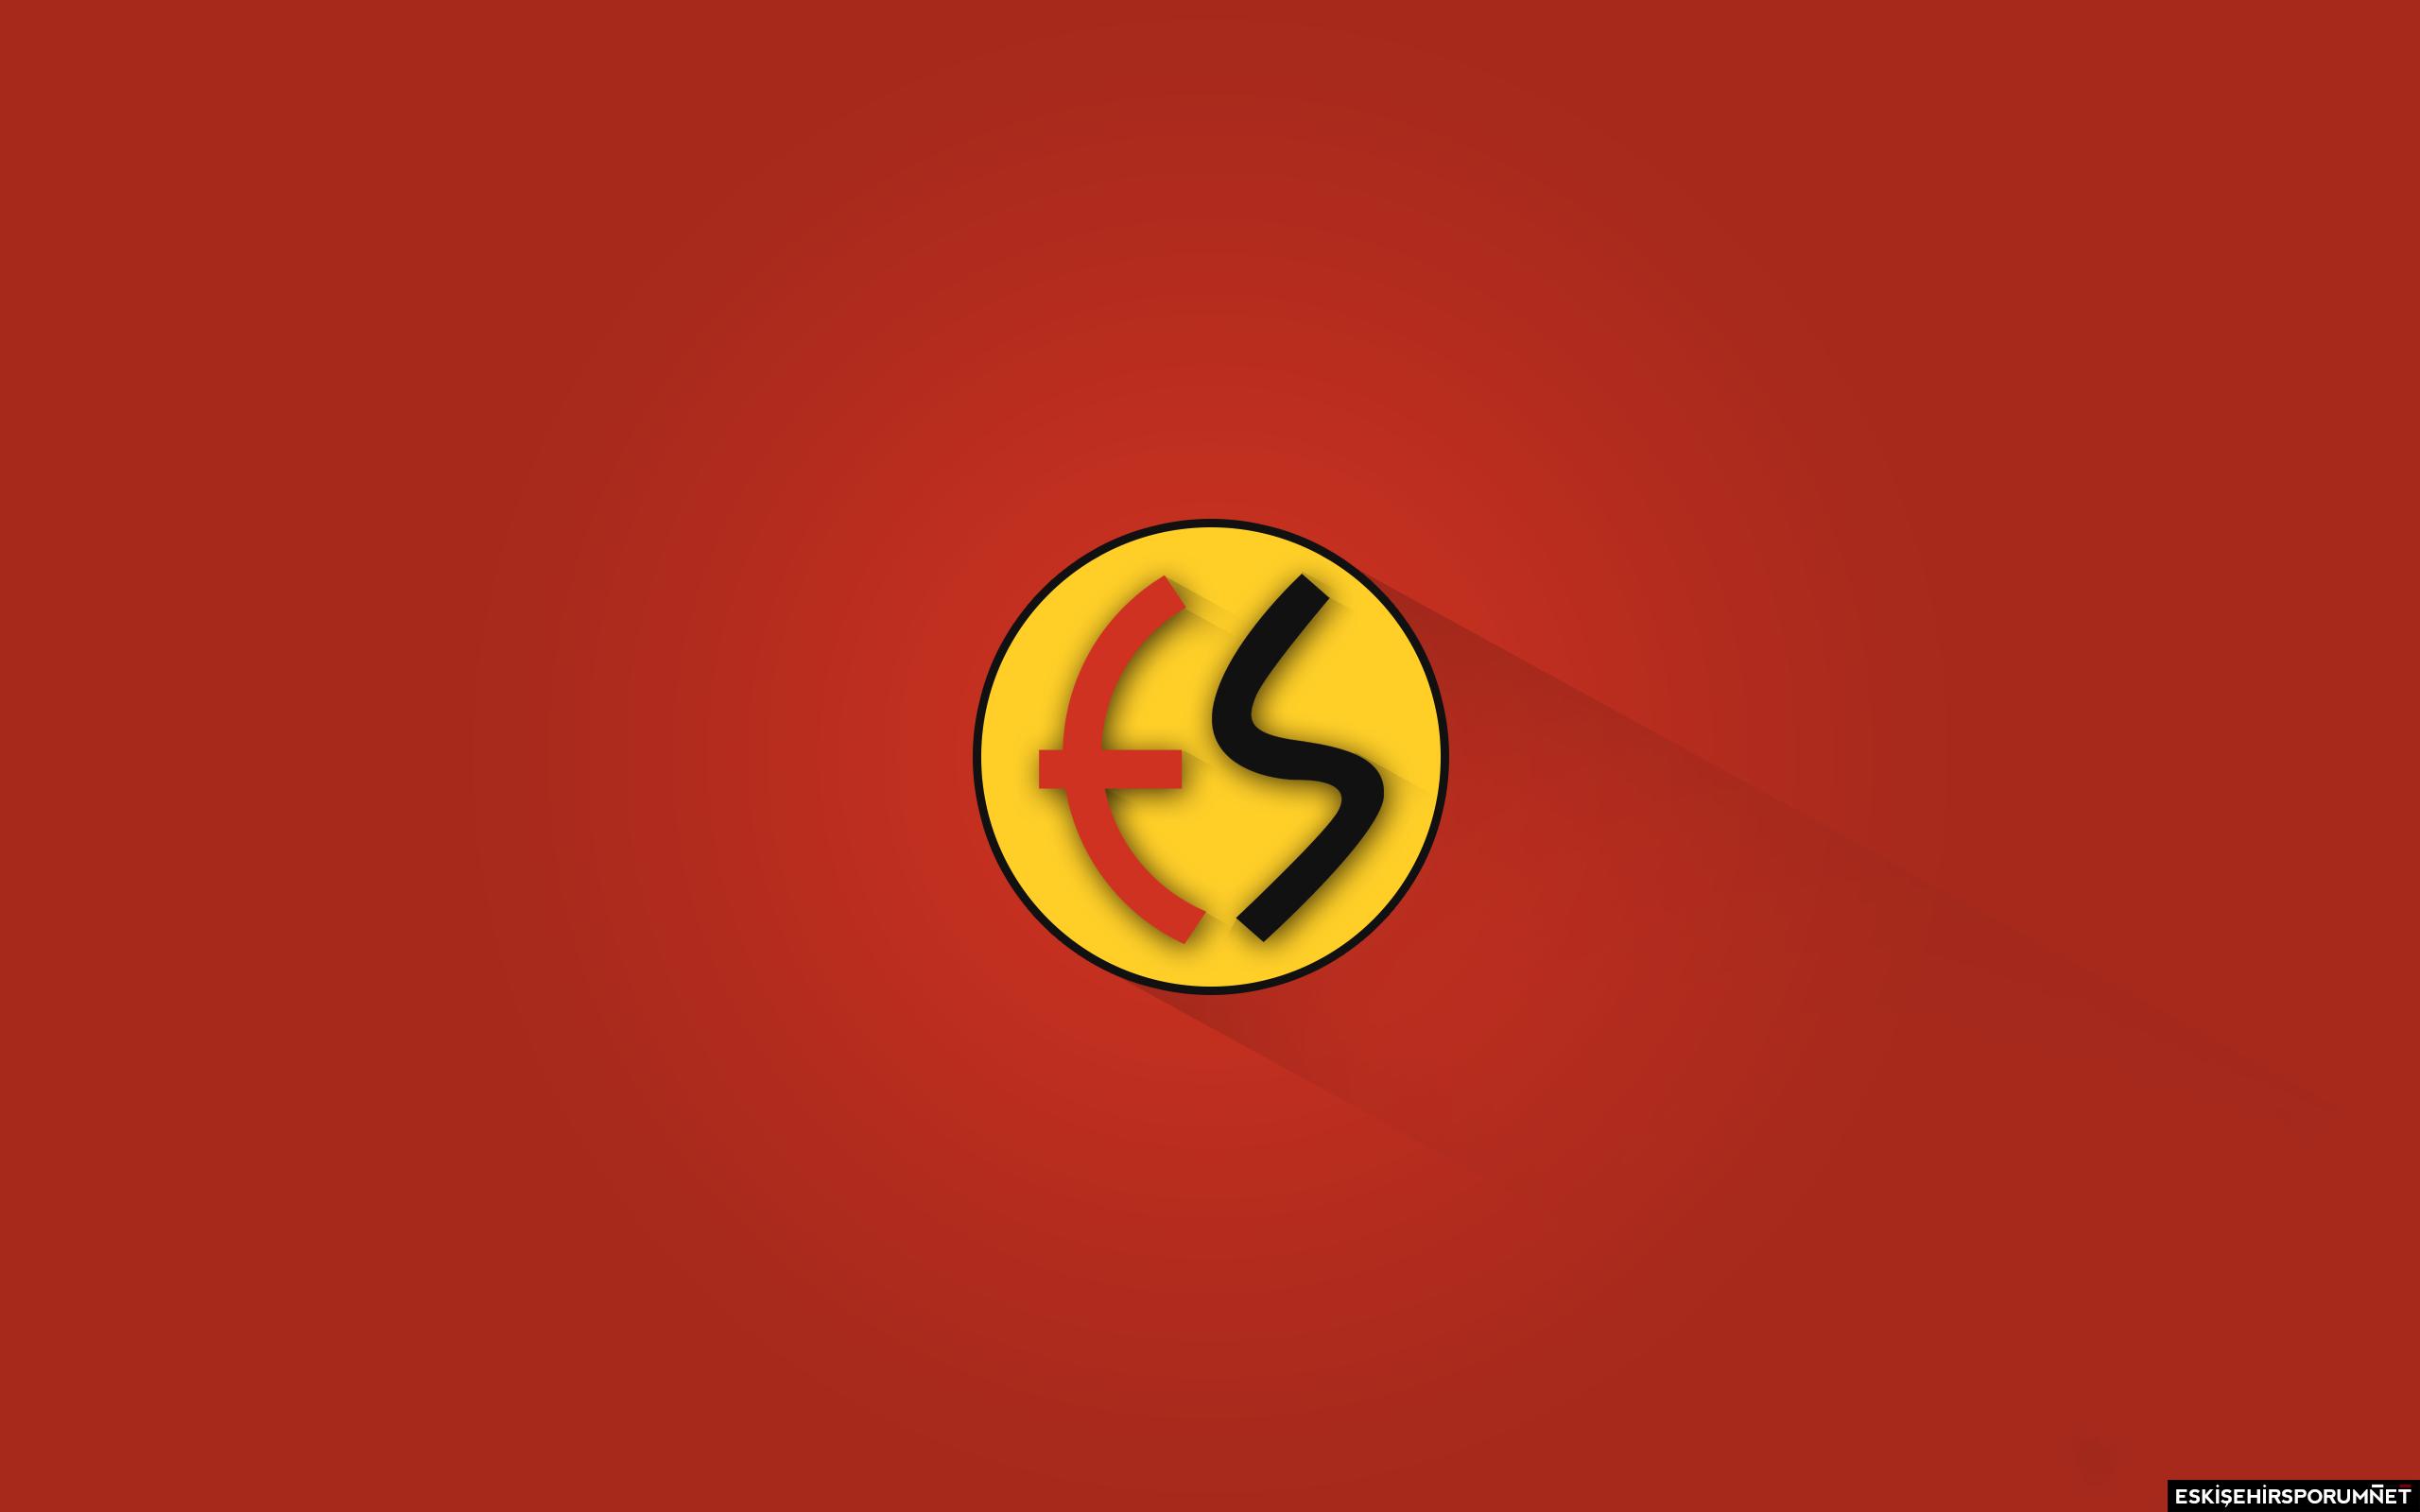 Eskisehirspor minimalist logo by eskshrsprmnet on deviantart for Minimal art logo